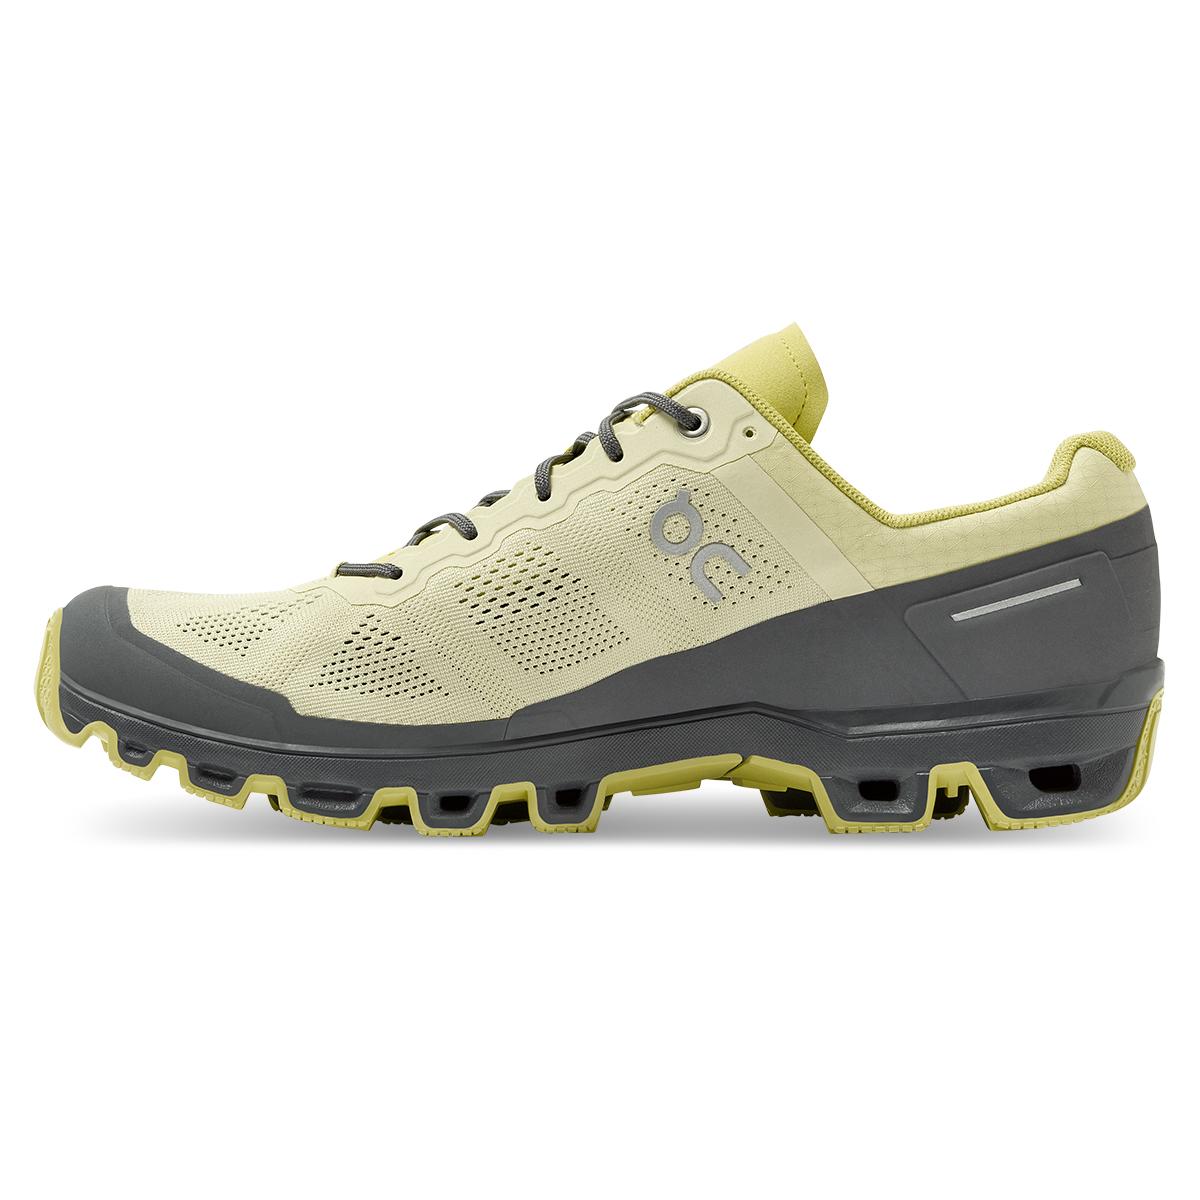 Men's On Cloudventure Running Shoe - Color: Hay/Rock - Size: 7 - Width: Regular, Hay/Rock, large, image 2